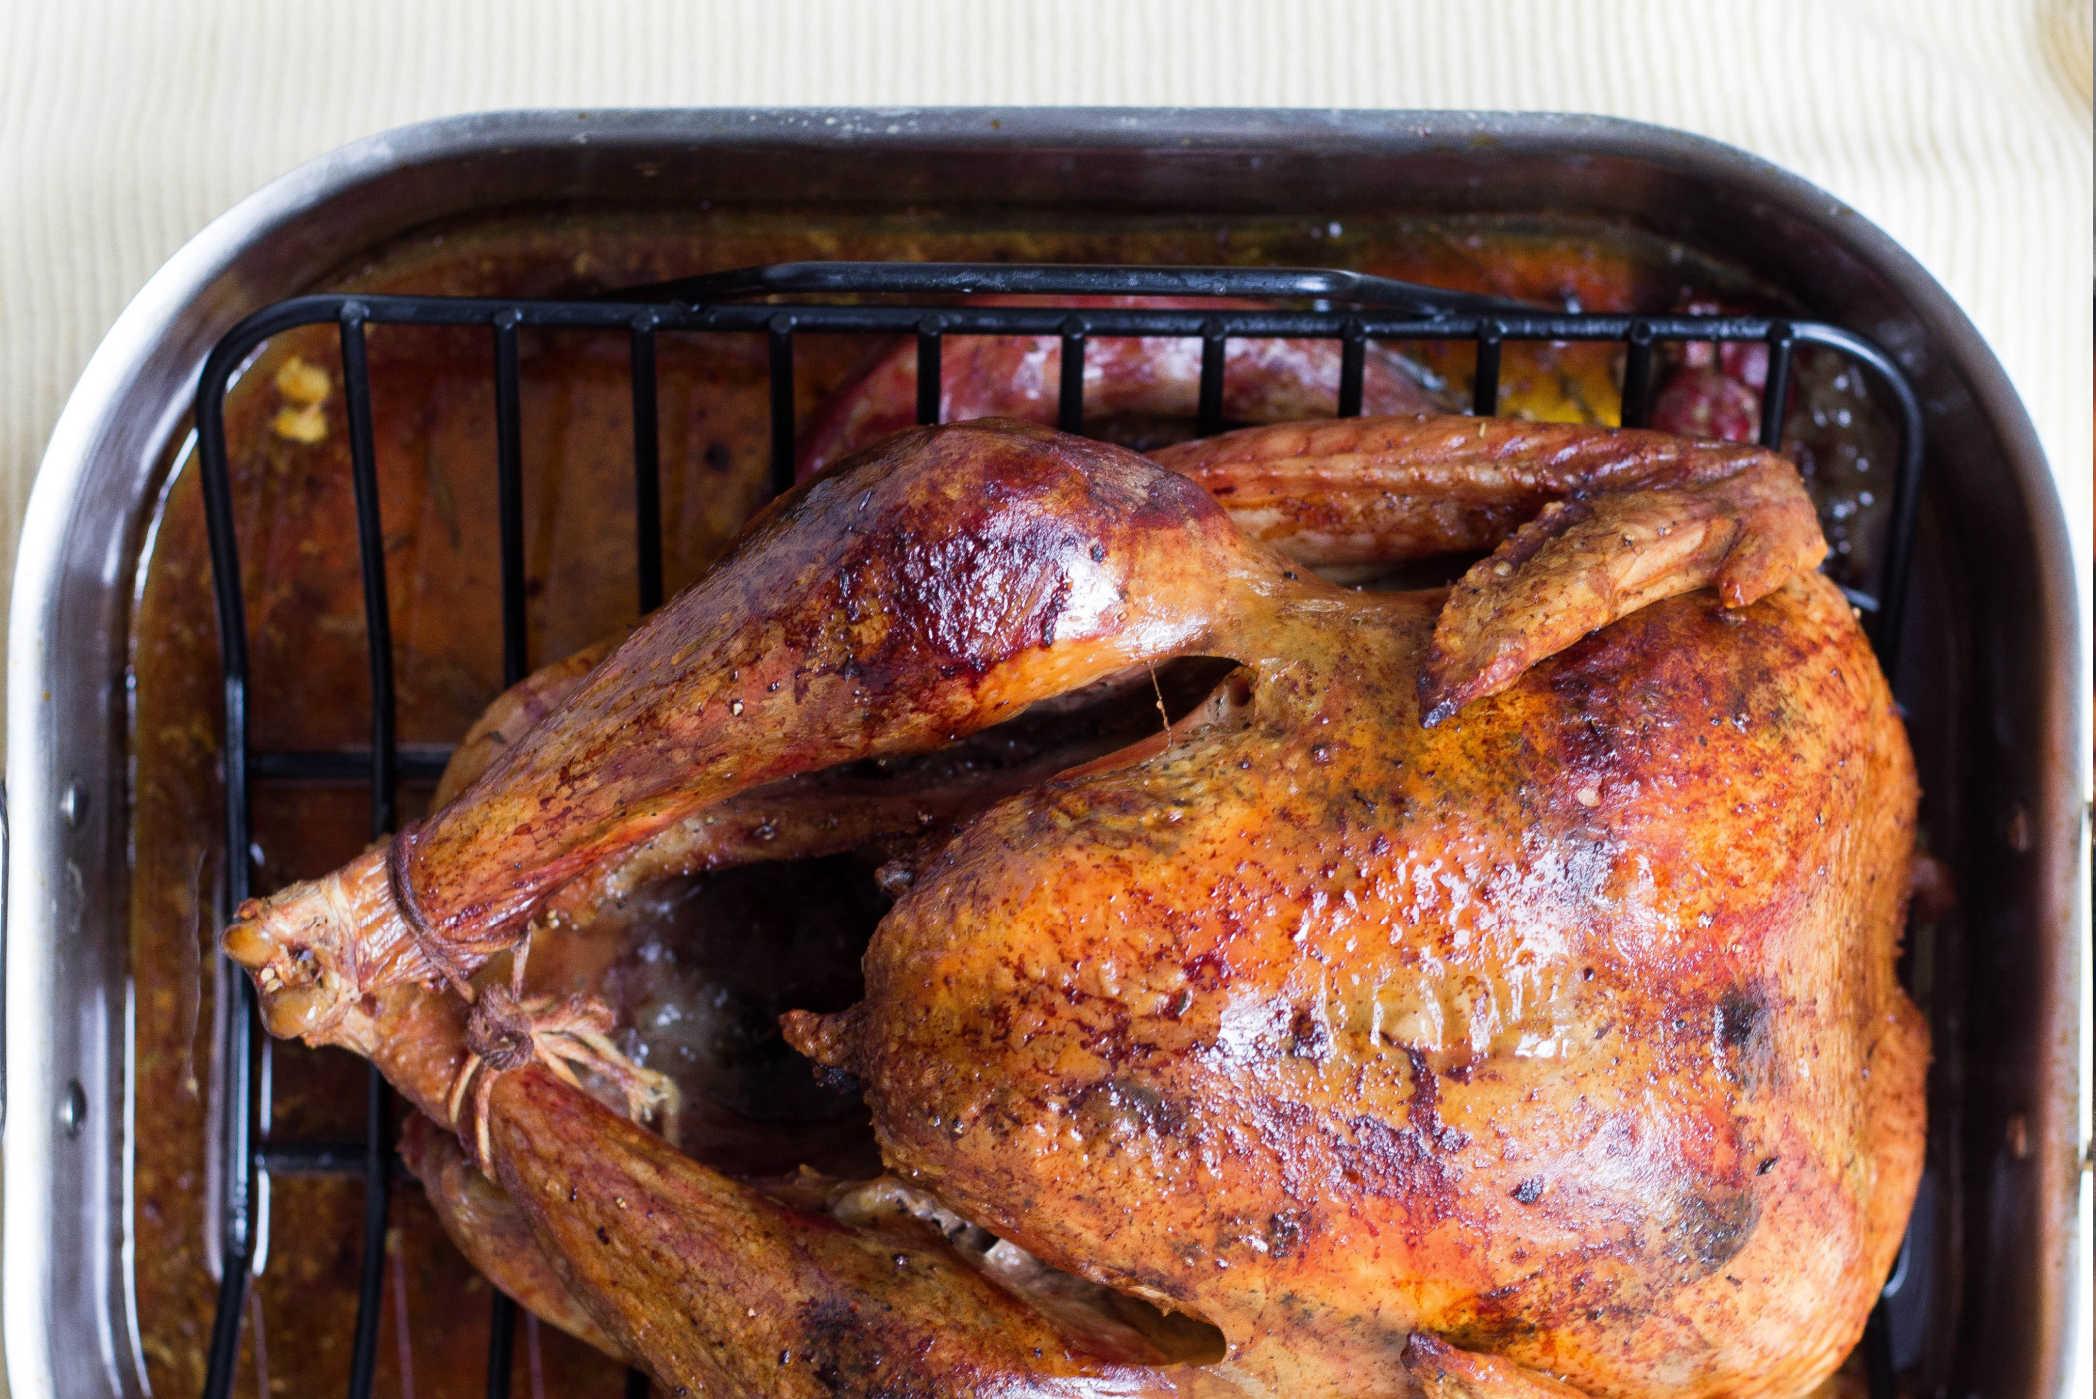 Wood fired roast chicken